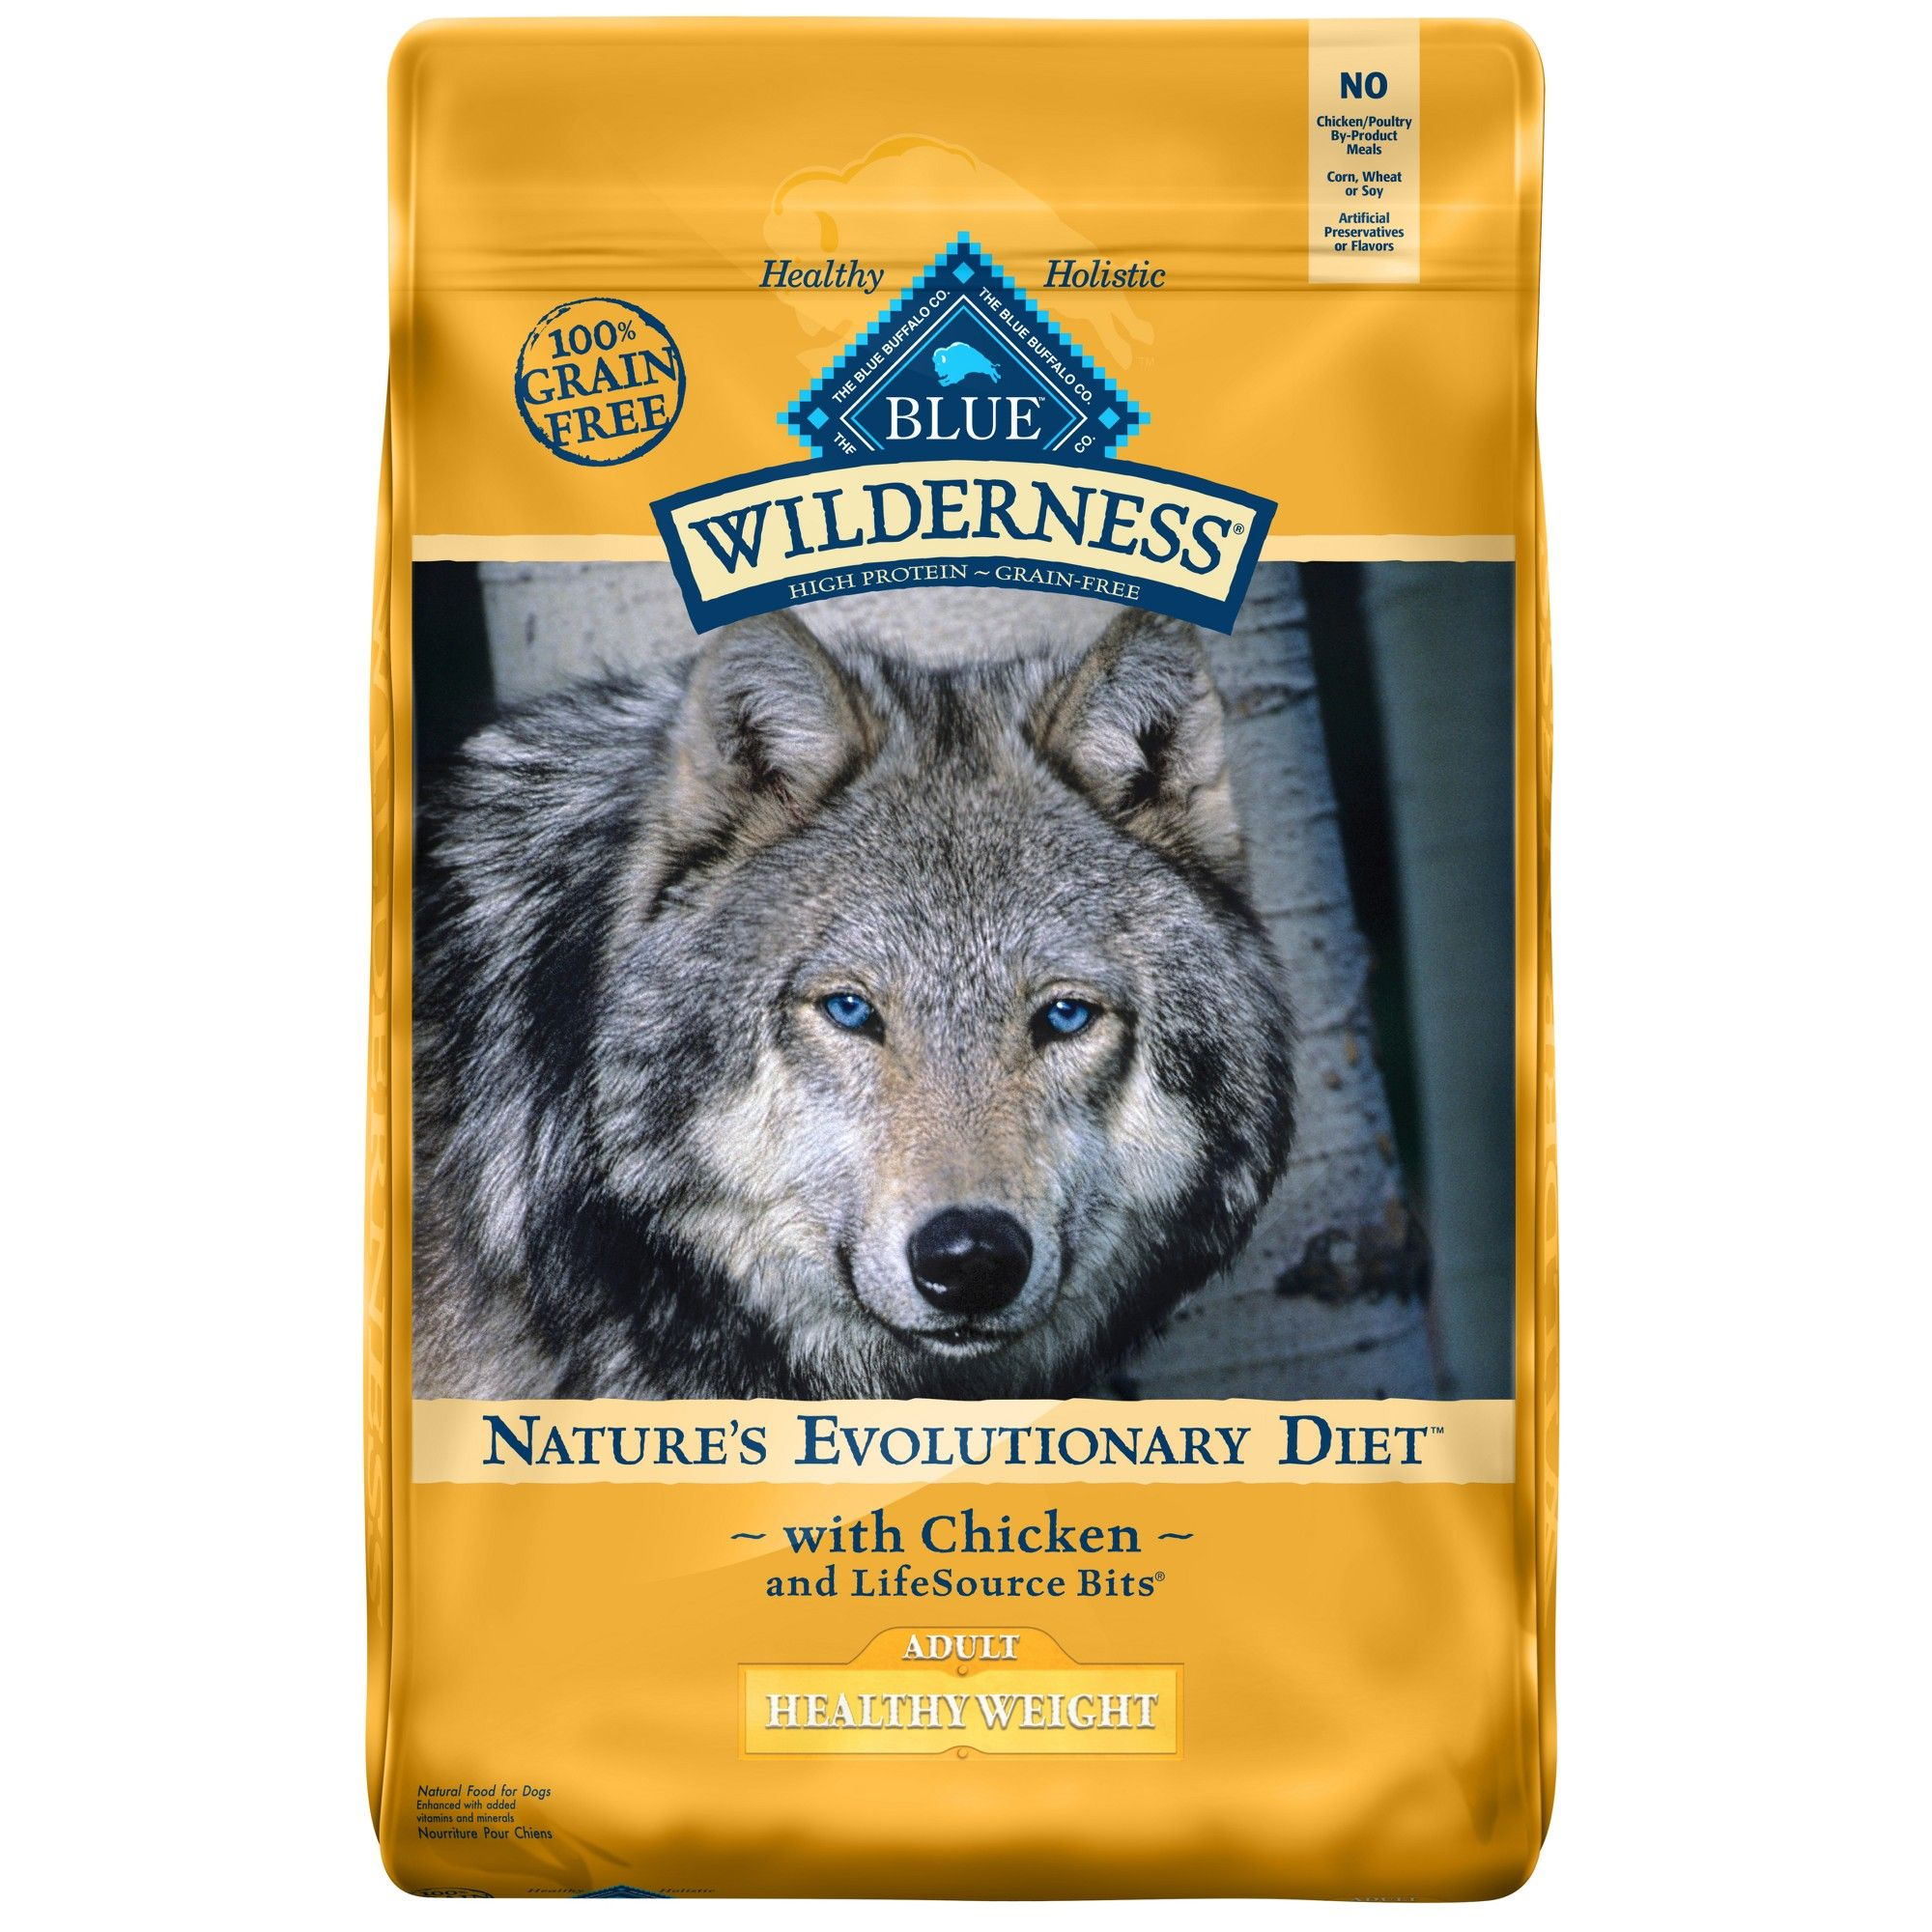 Blue Buffalo Wilderness 100 Grain Free Chicken Adult Healthy